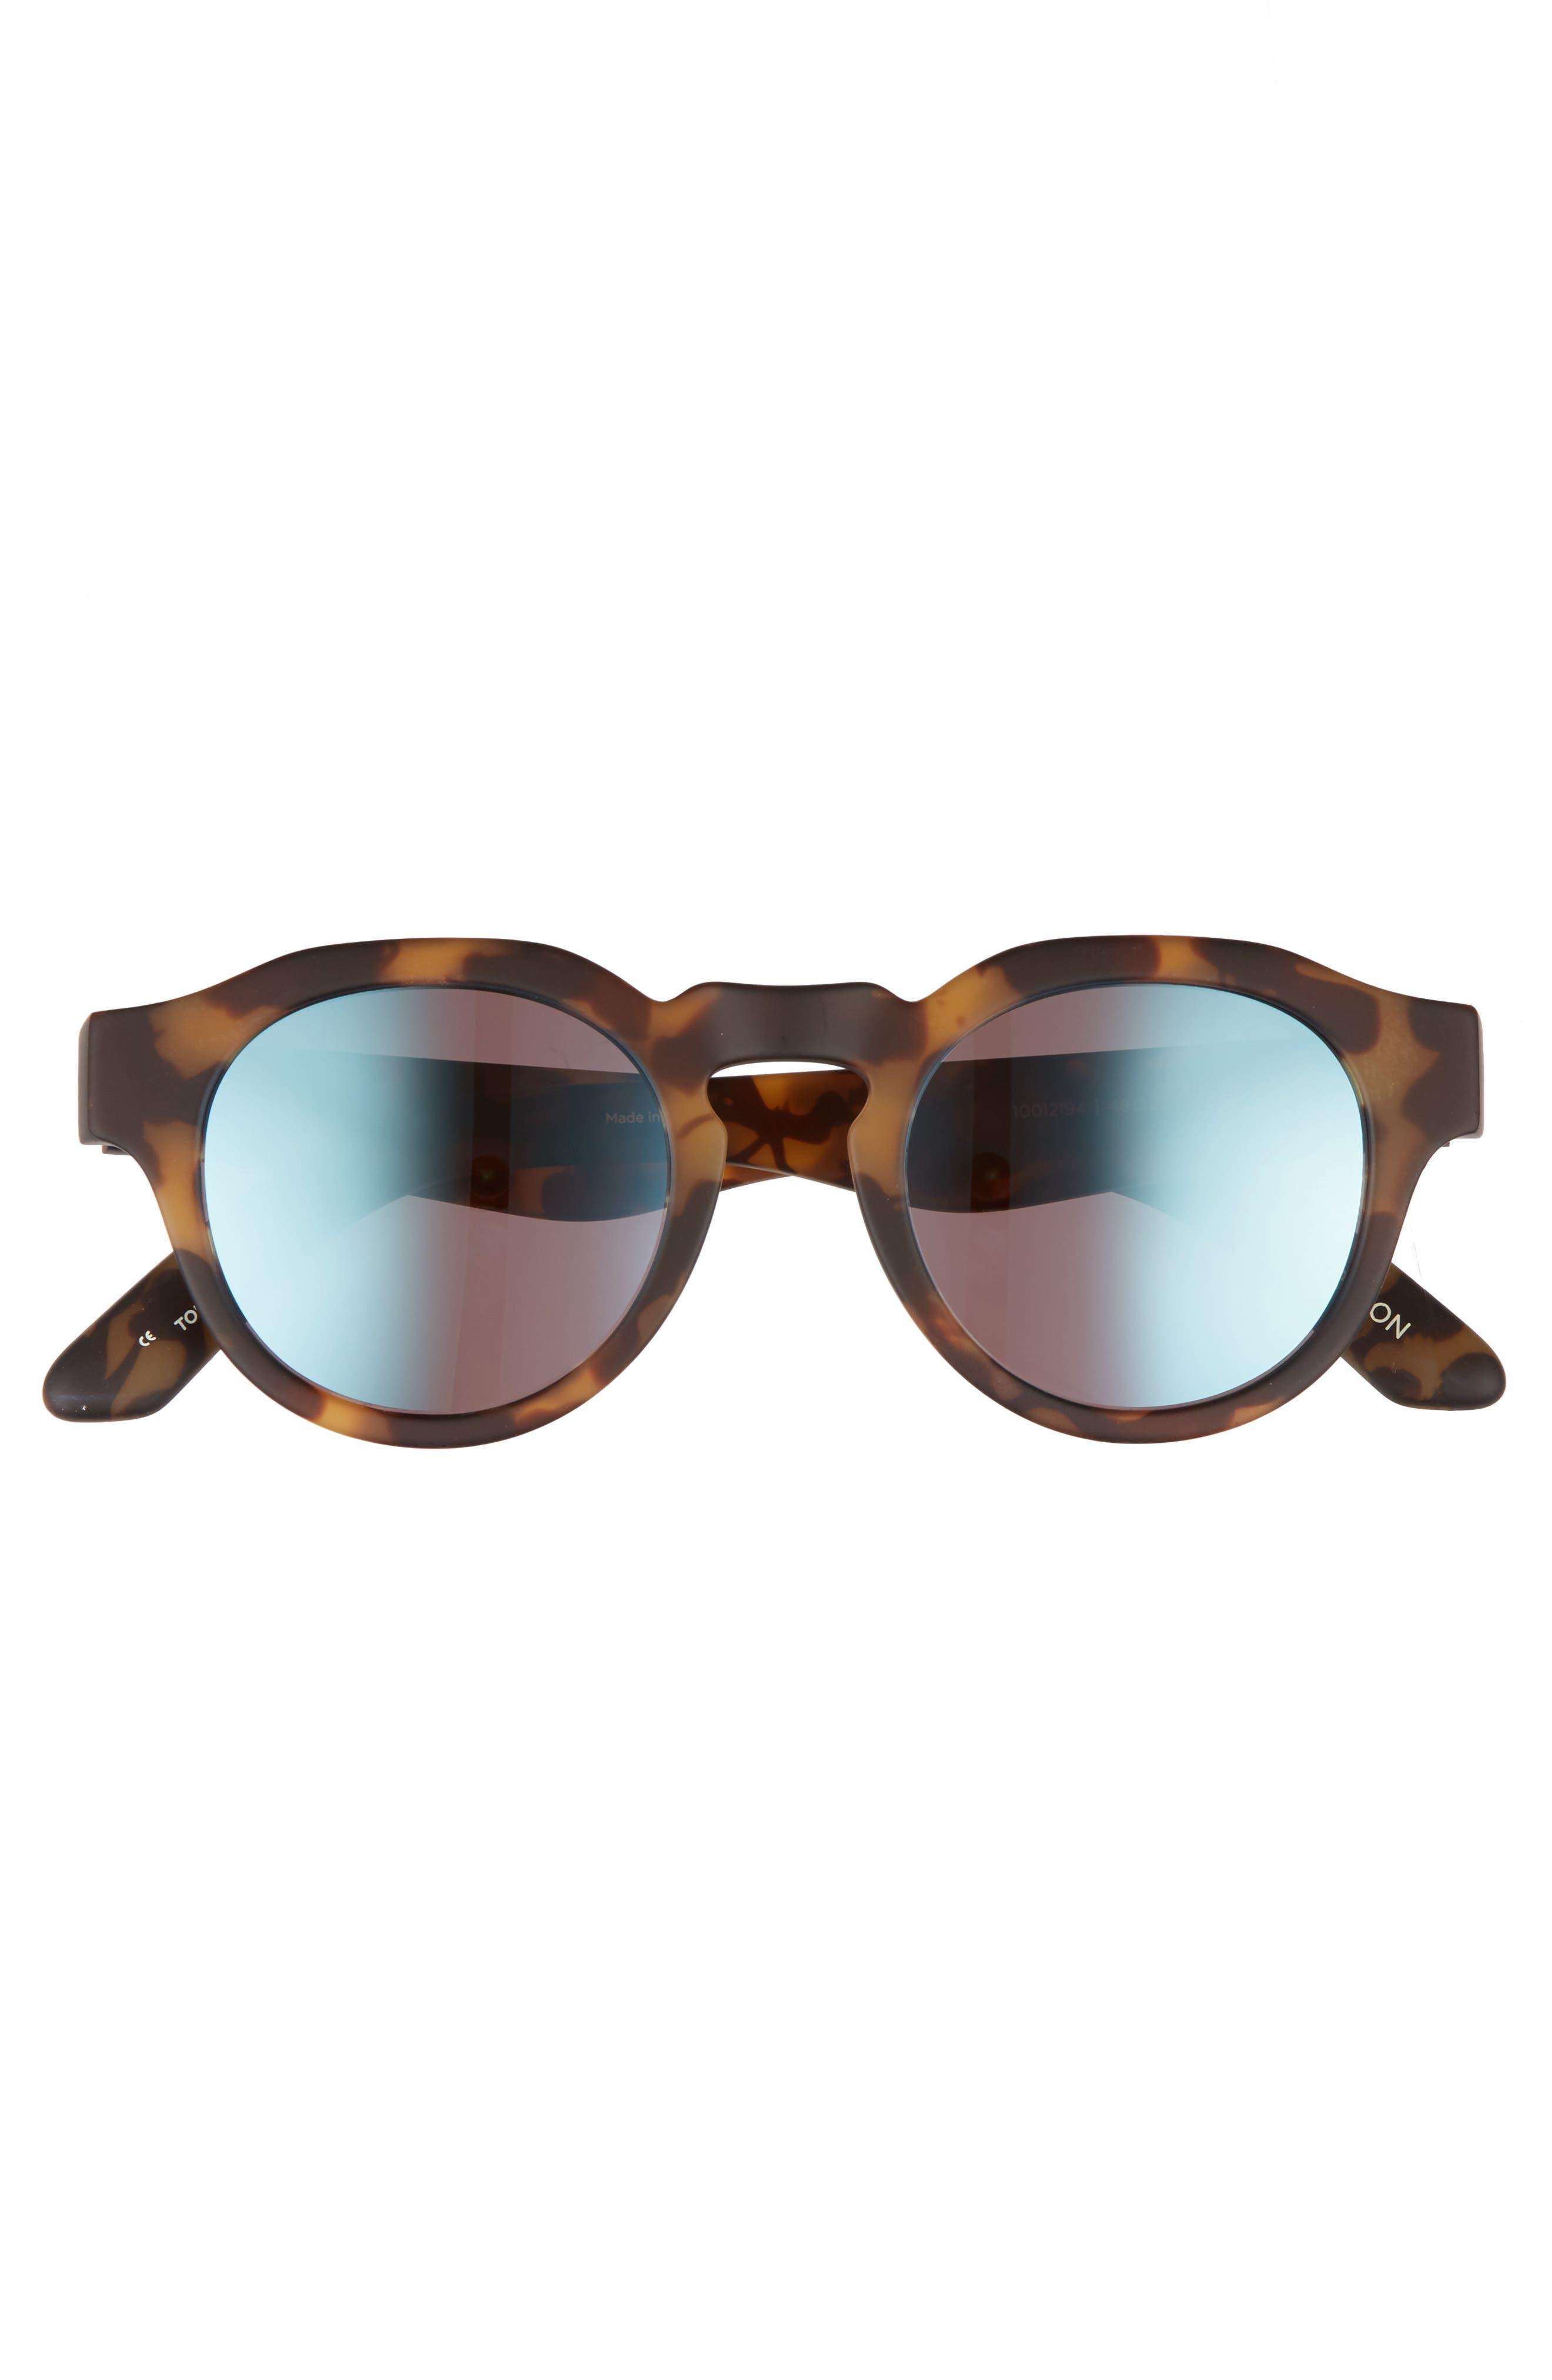 Bryton 48mm Sunglasses,                             Alternate thumbnail 2, color,                             200